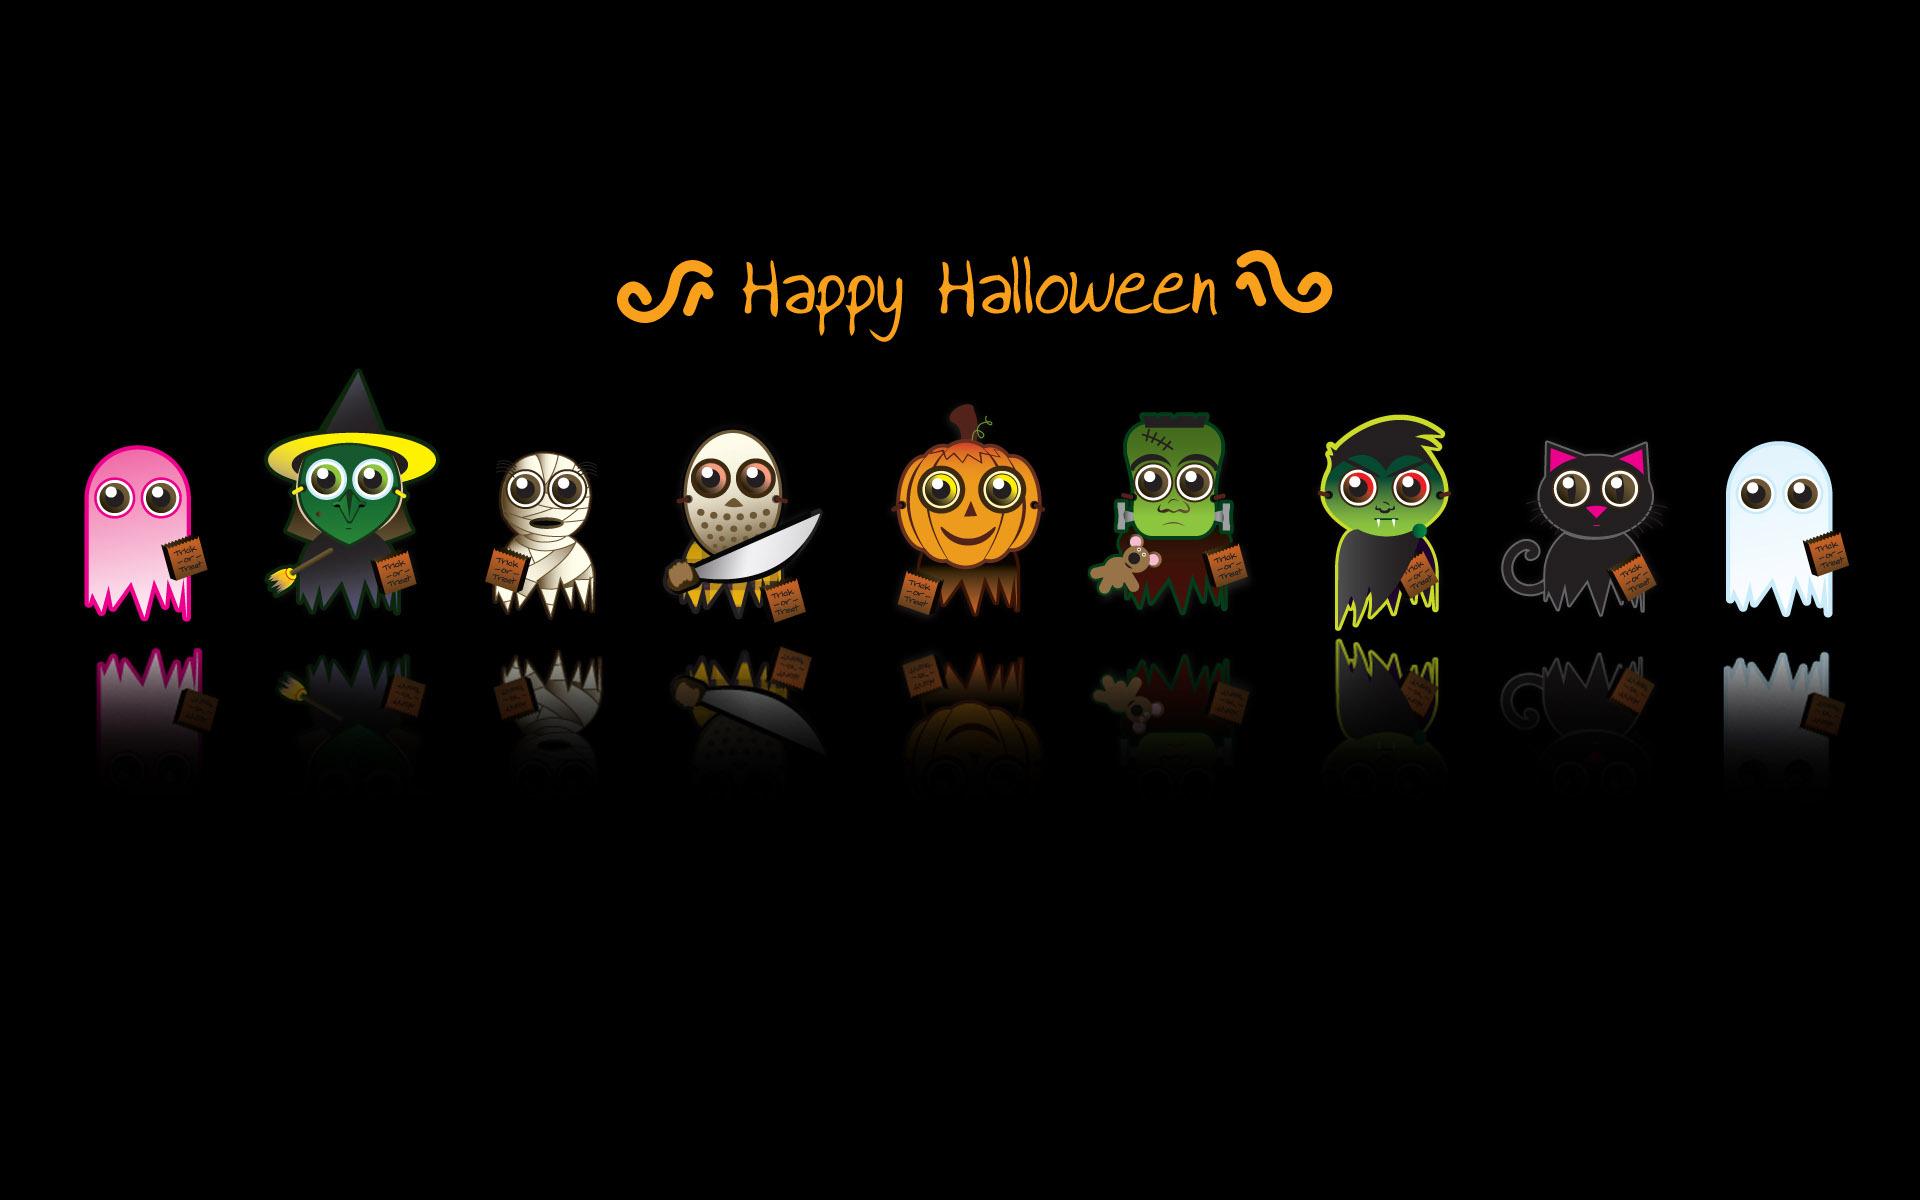 Halloween desktop wallpapers will do the trickor treat Cheerful 1920x1200